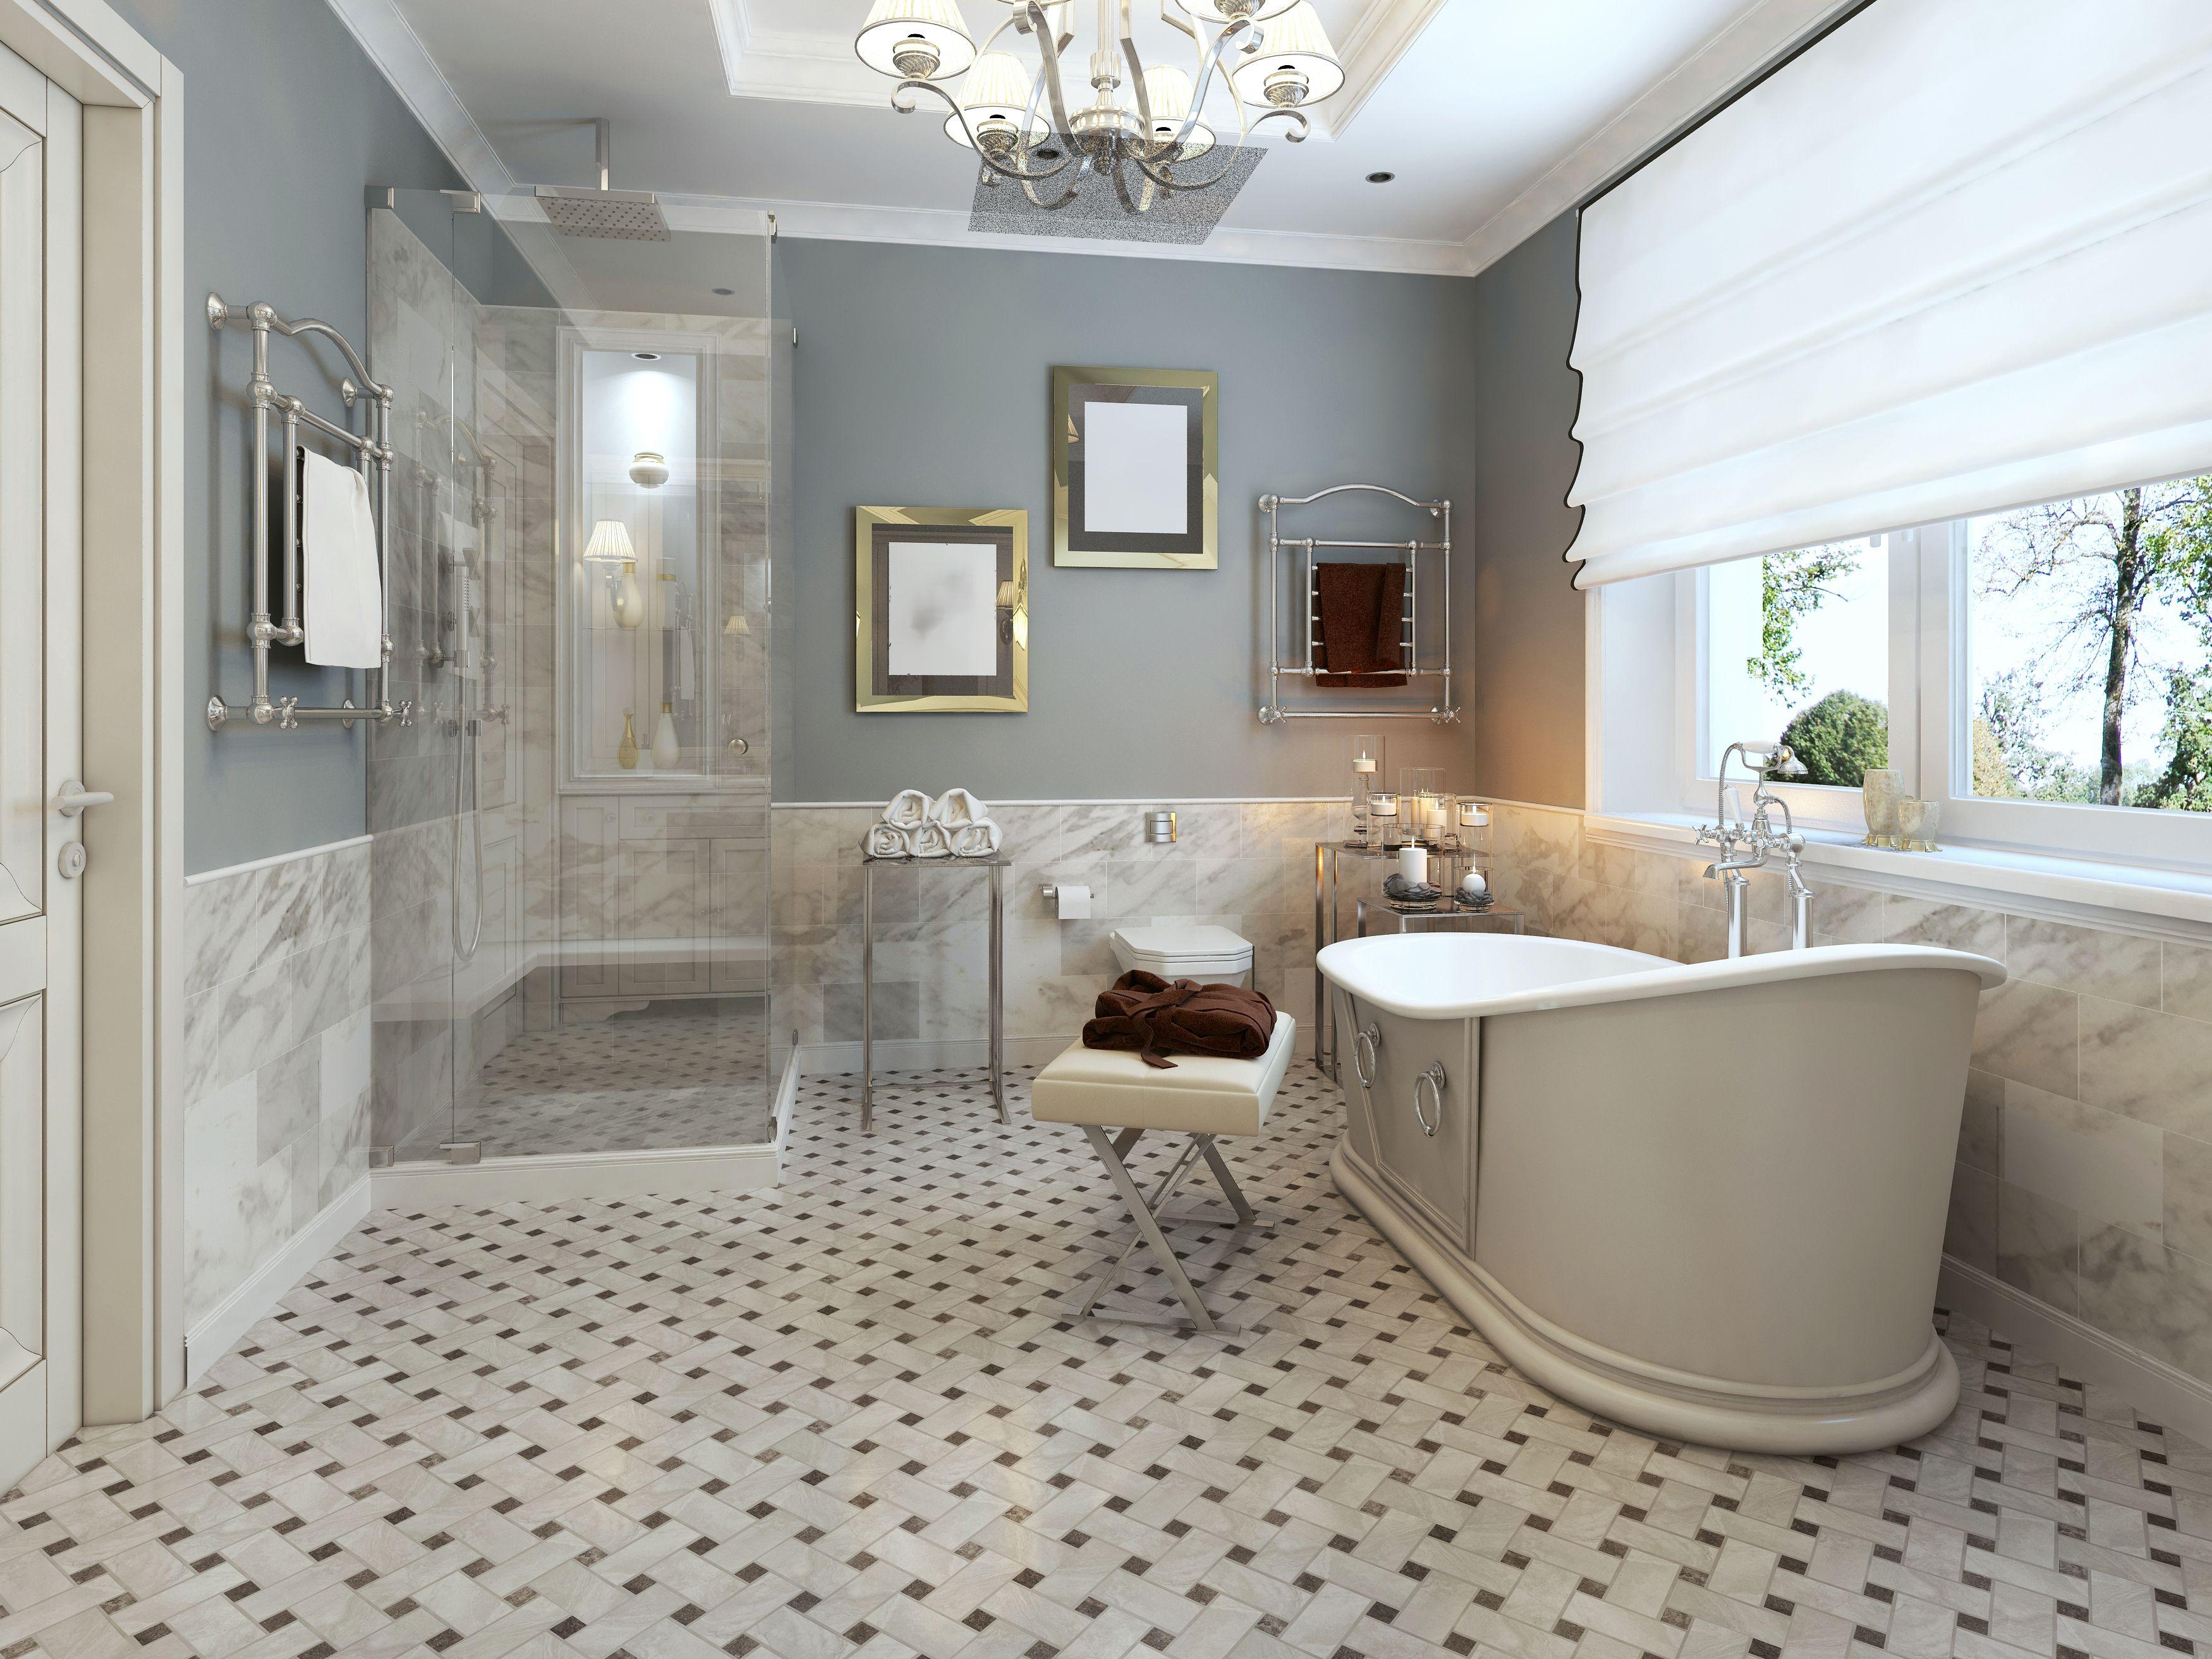 French Country Bathroom Design Ideas